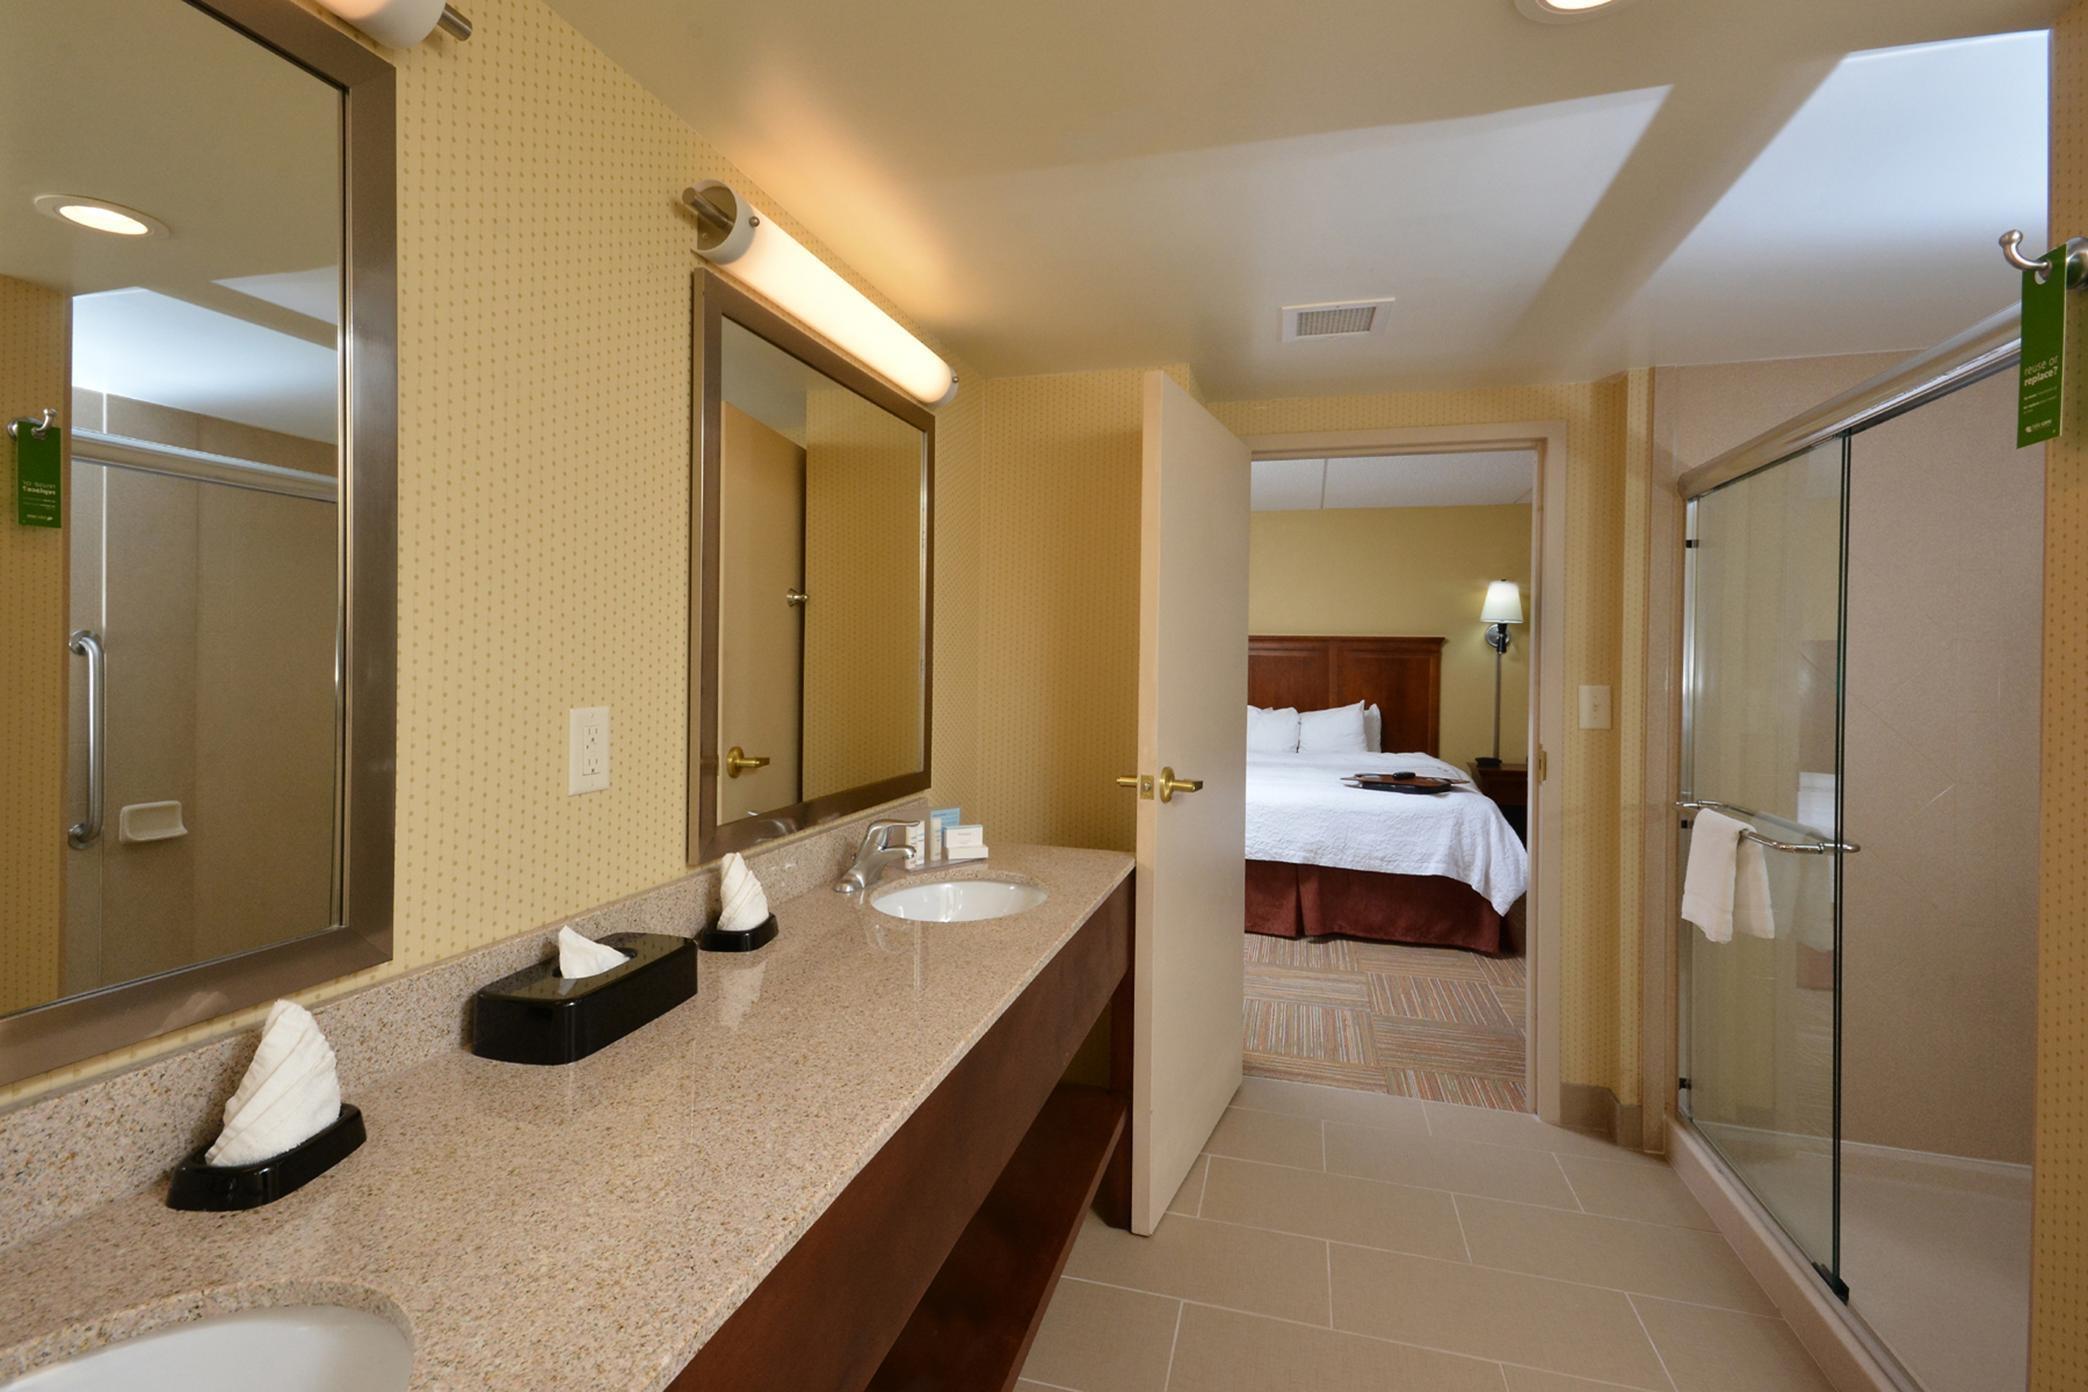 King 1 Bedroom Suite w Shower Only Bathroom